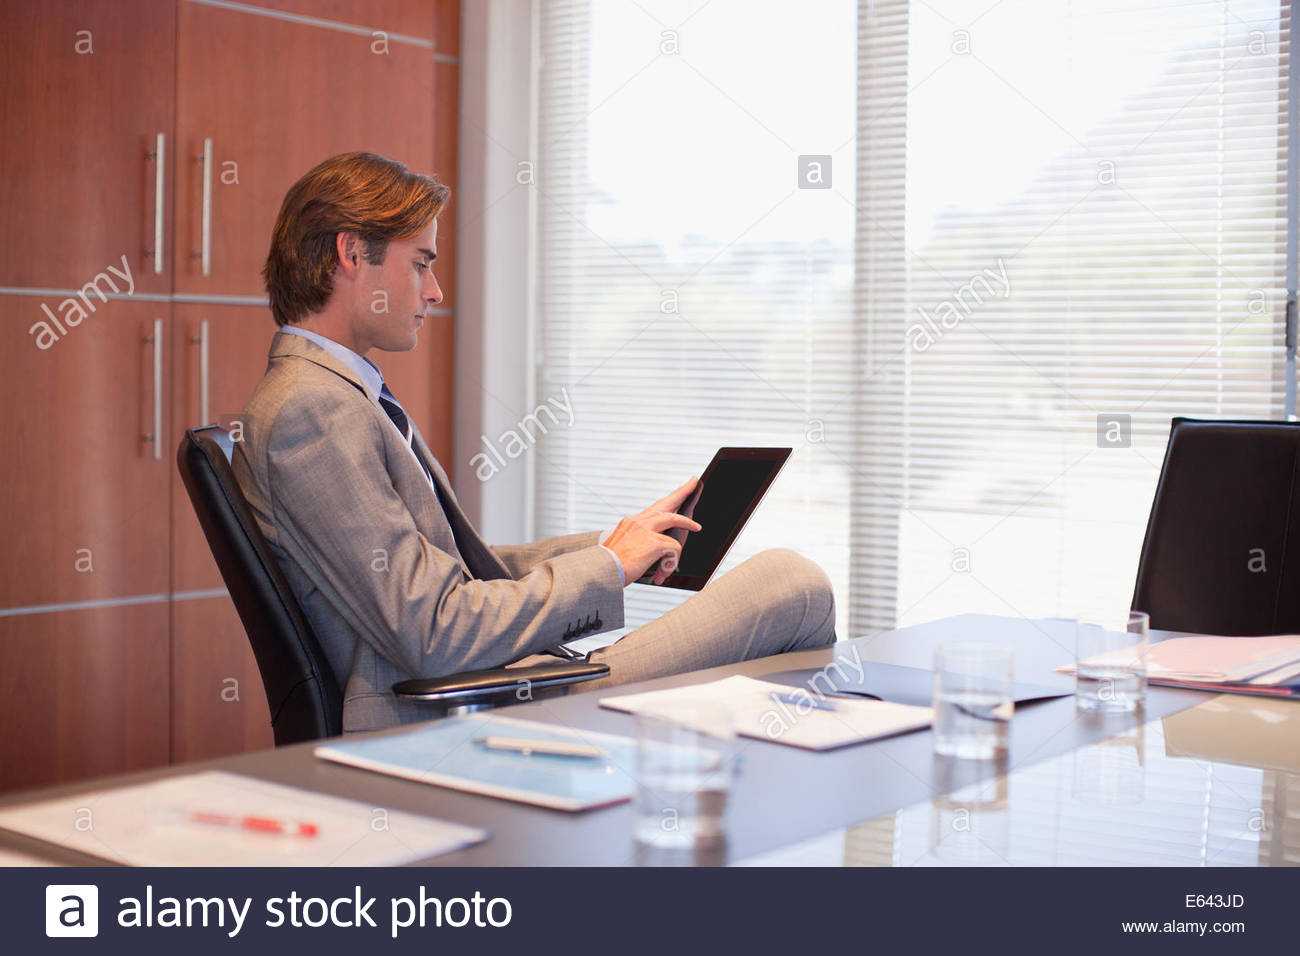 Businessman using digital tablet in office - Stock Image